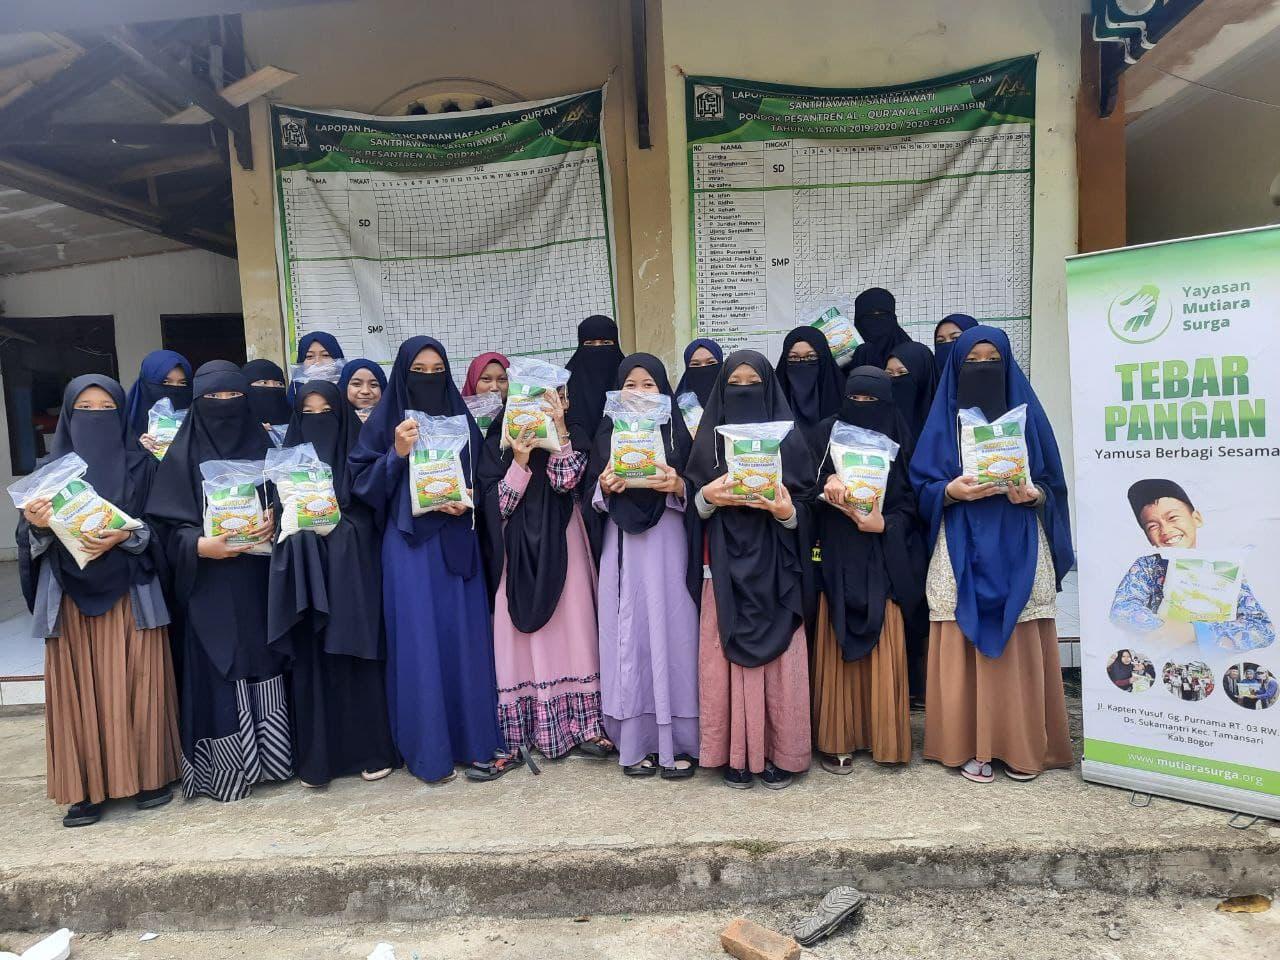 Peduli Pangan di Ponpes Al-Muhajirin Leuwiliang Bogor